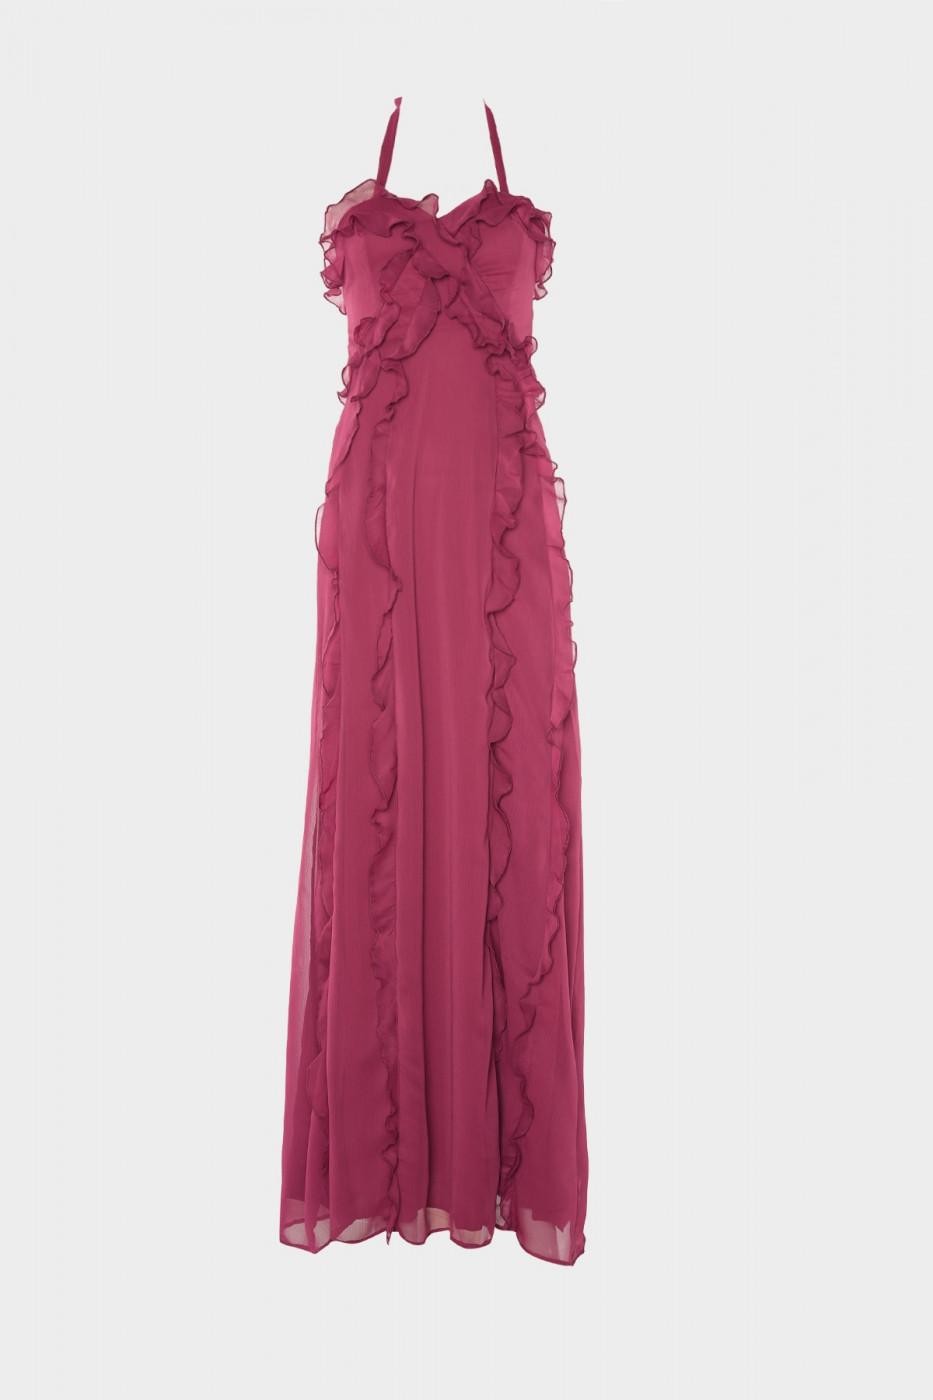 Trendyol Mürdüm Frill Detailed Evening Dress & Graduation Dress